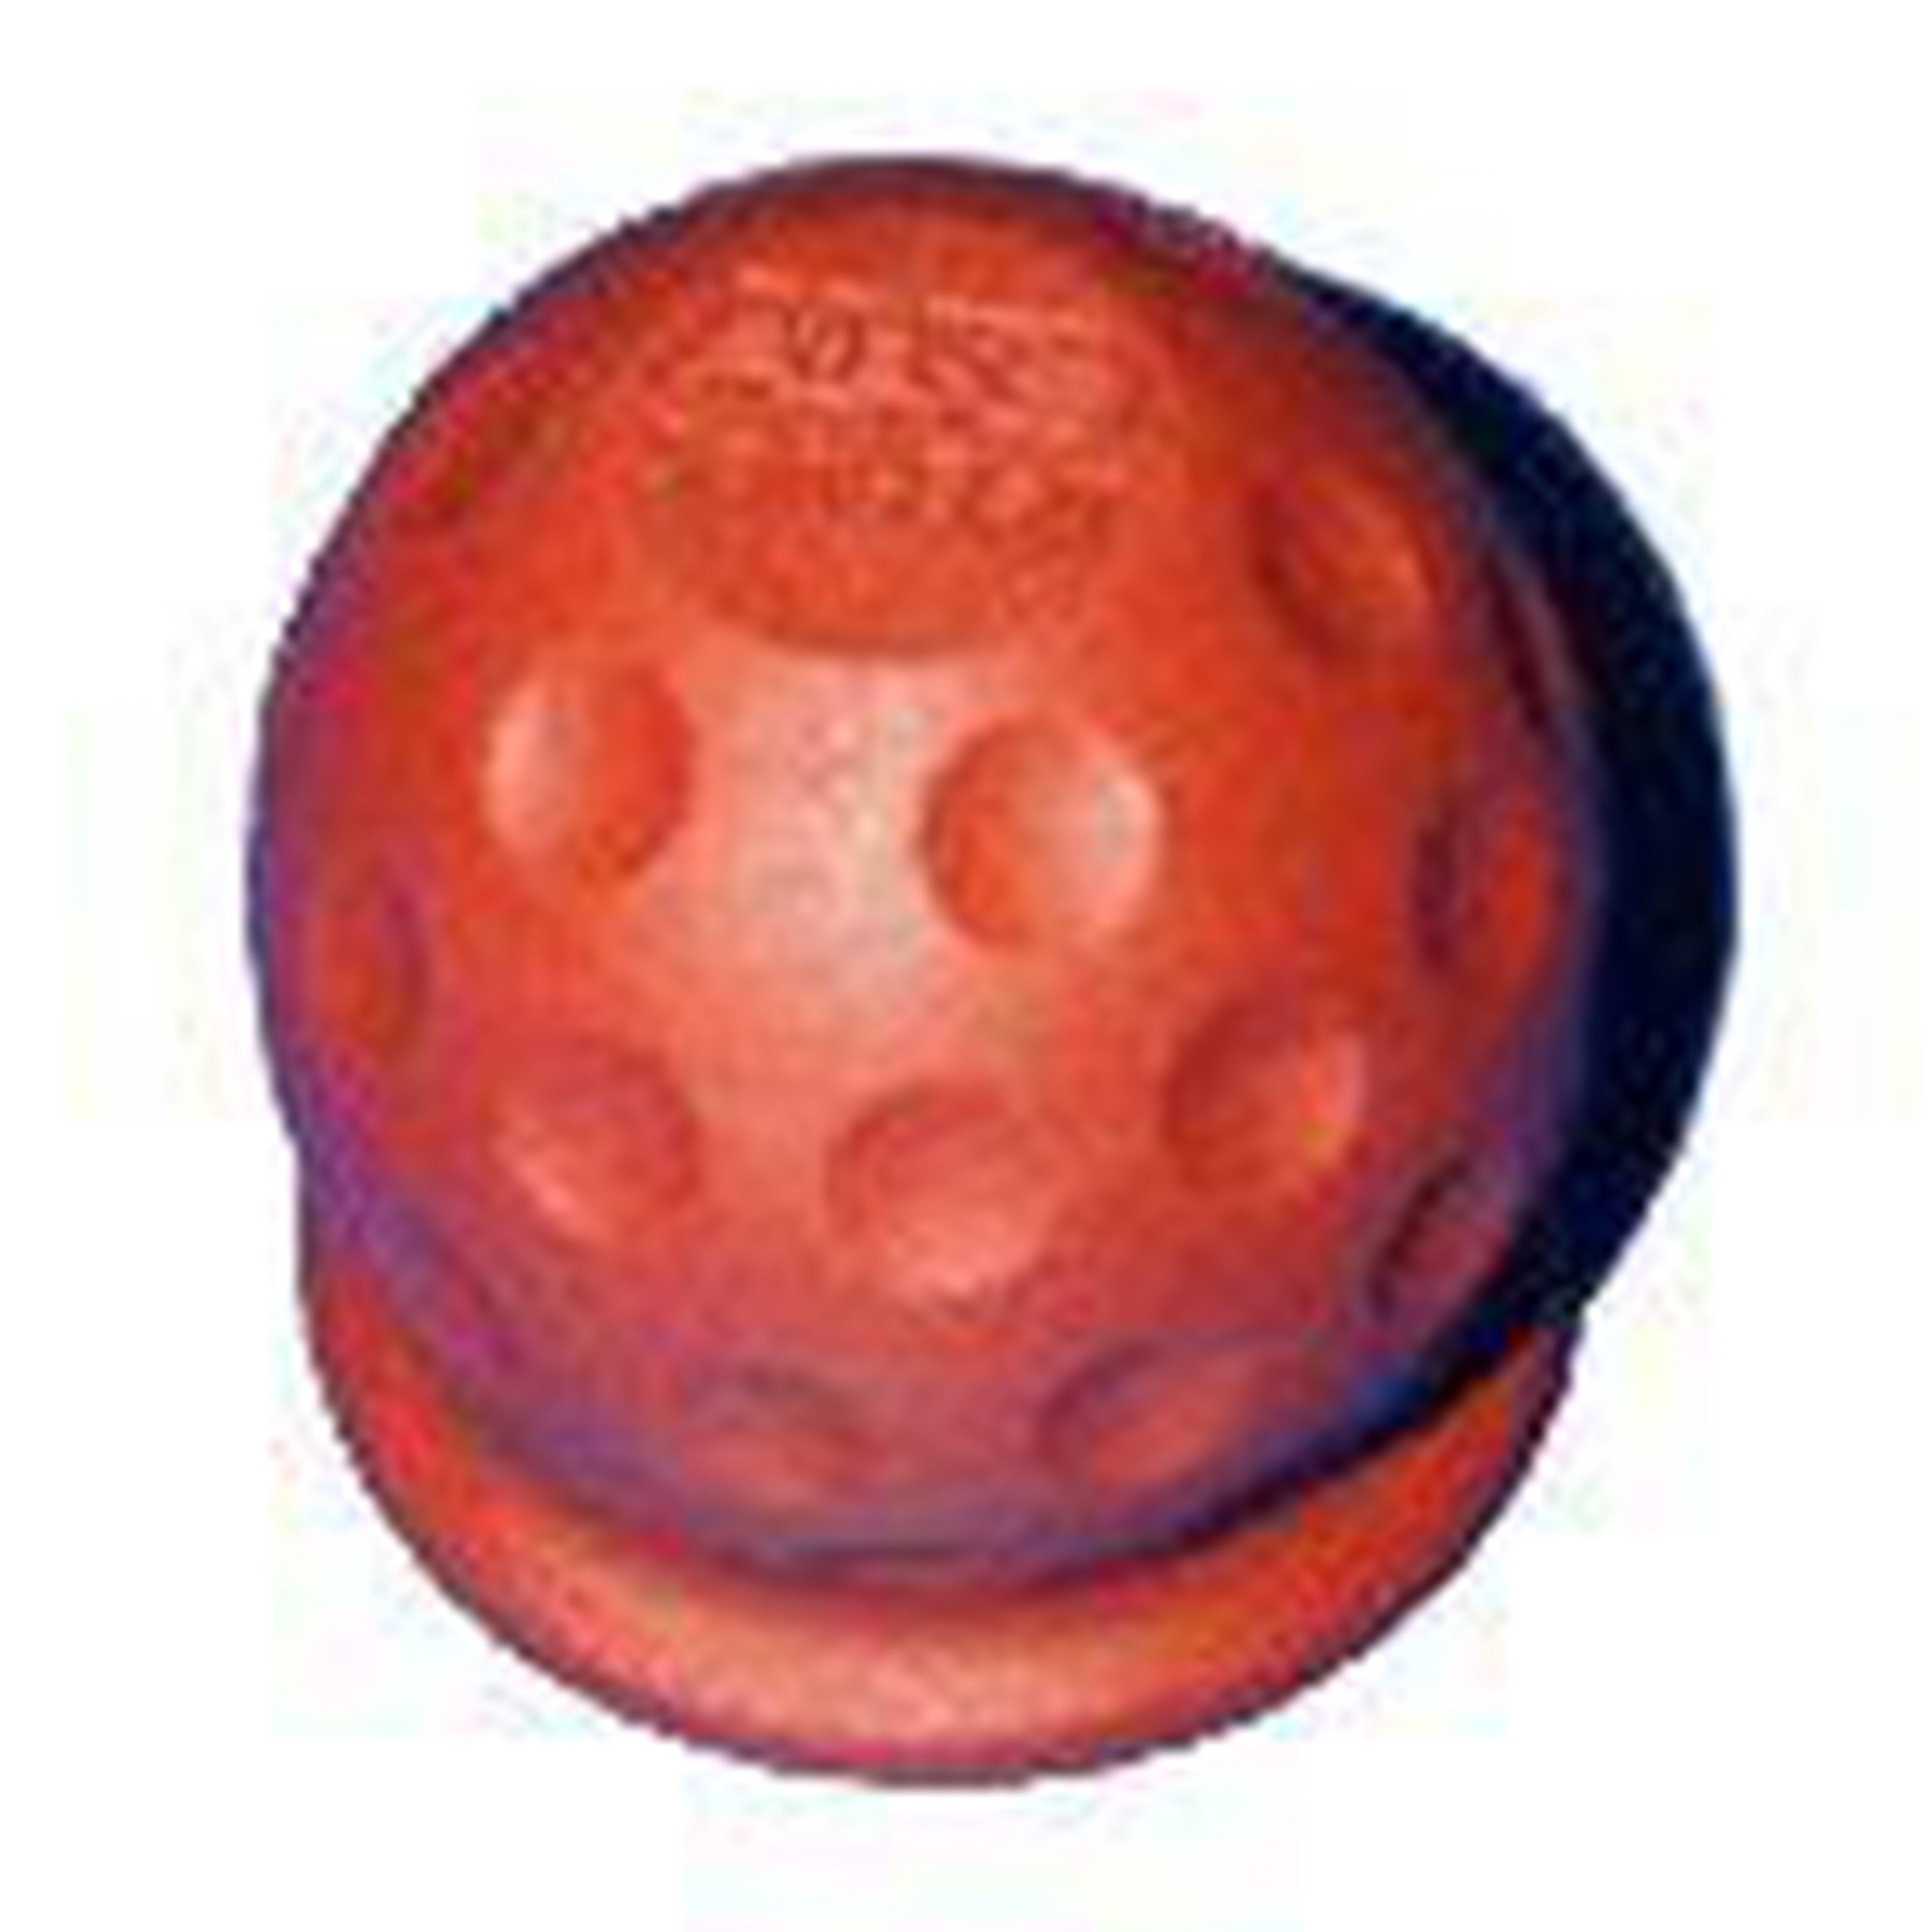 AL-KO Soft Ball Towball Cover, NOCOLOUR/BALL